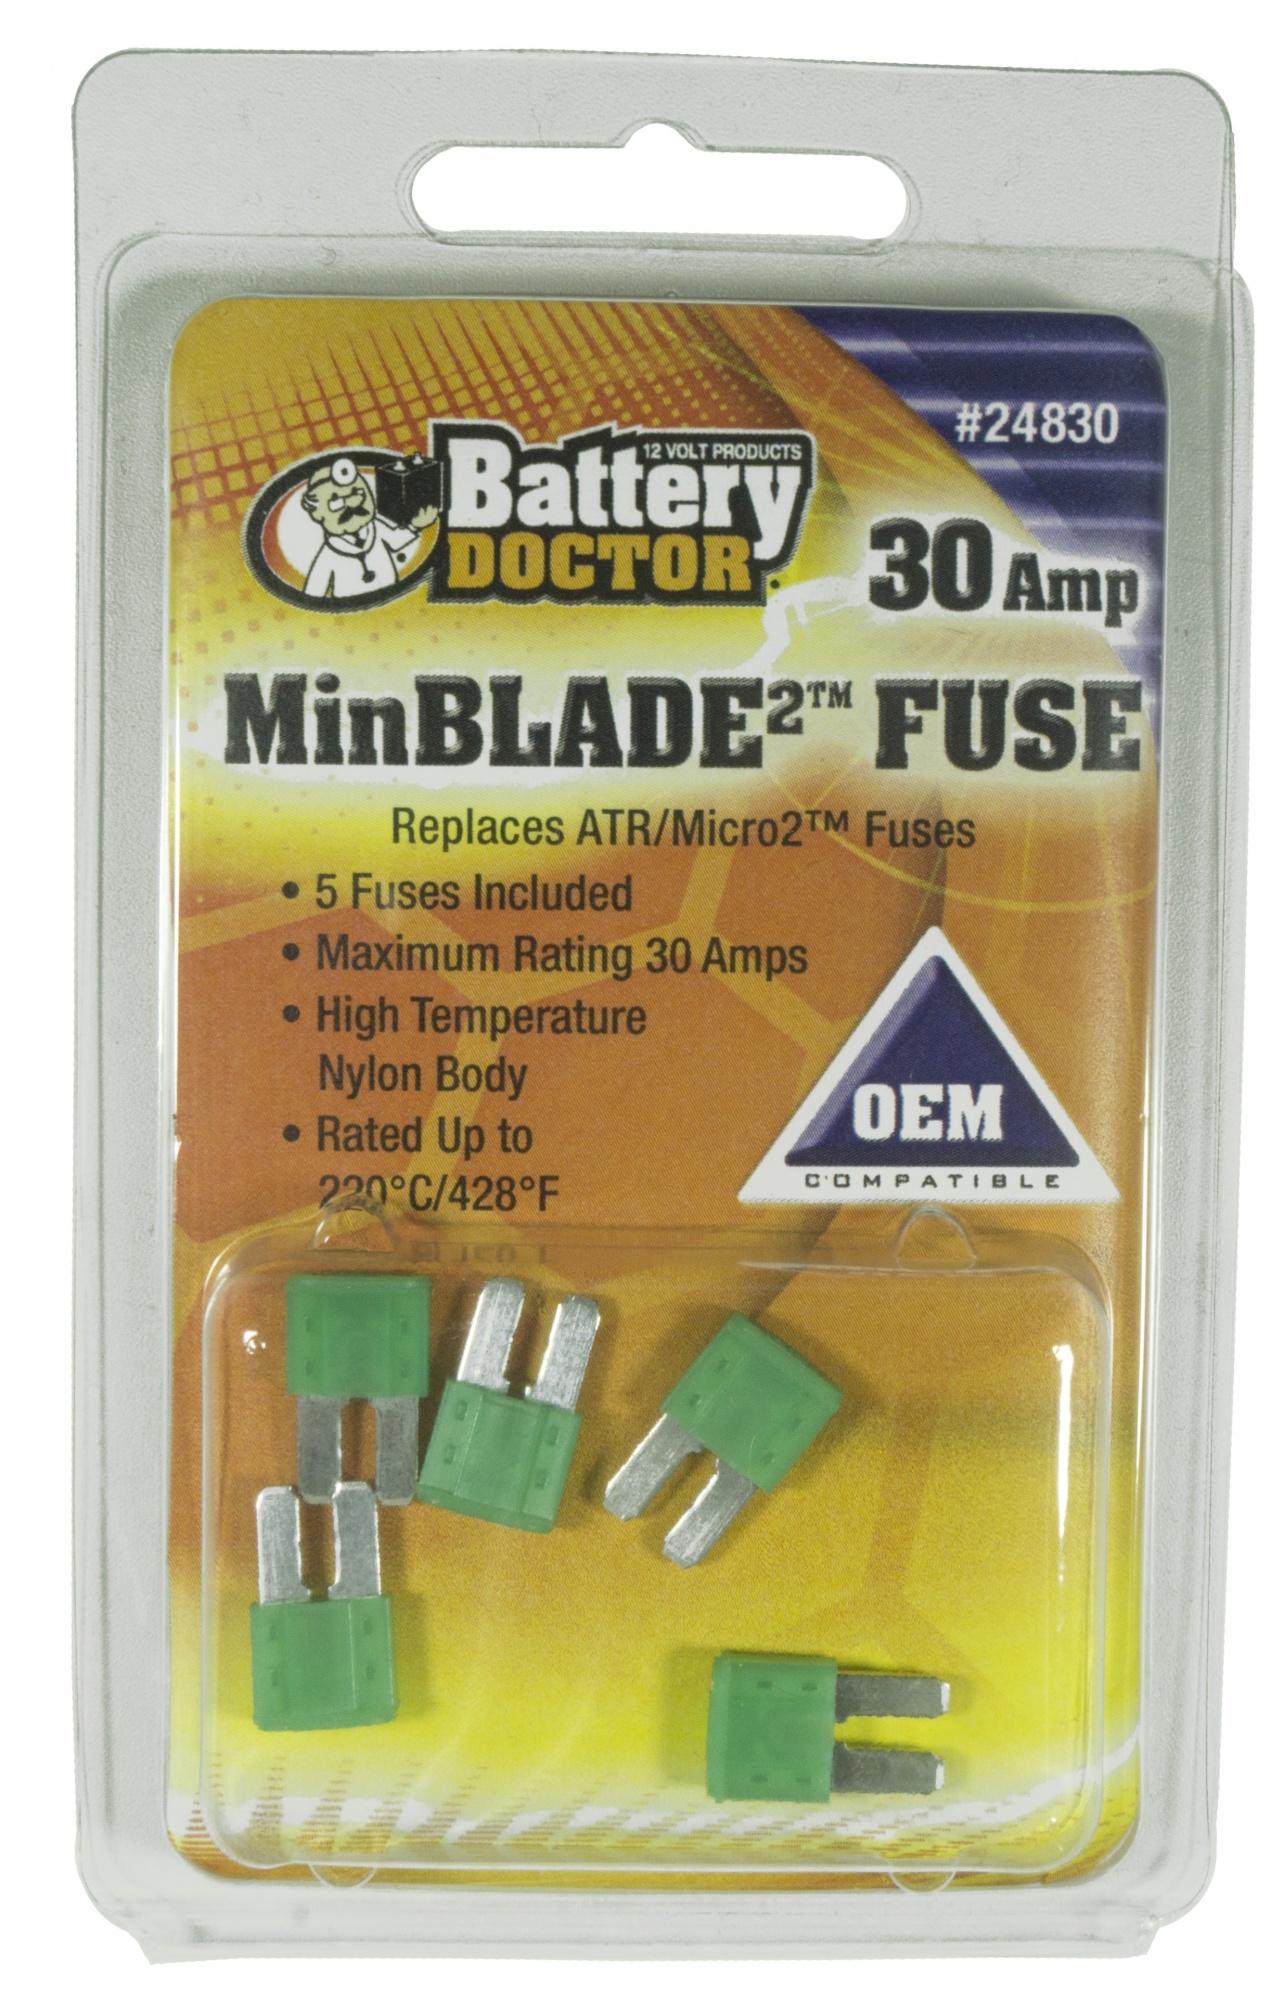 hight resolution of 30 amp minblade2 fuse 5 retail 24830